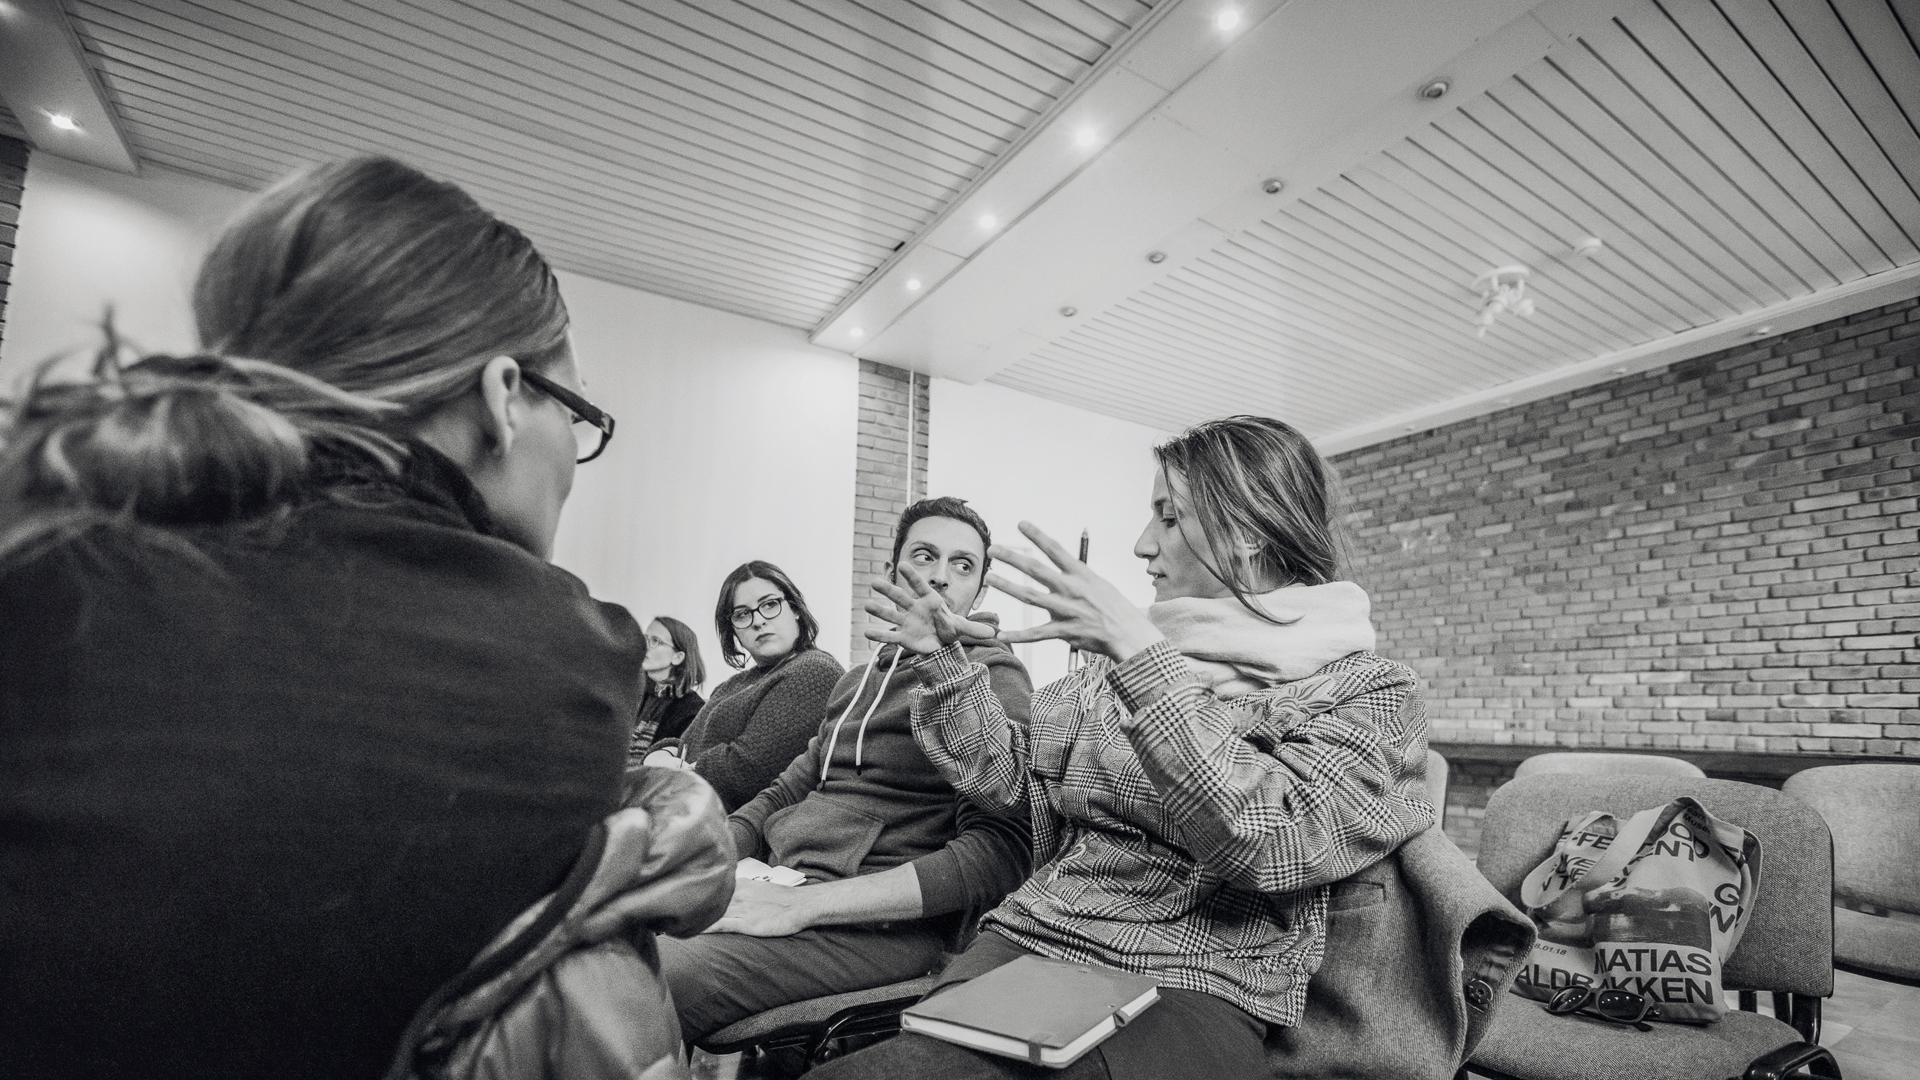 StoryTANK, the European Think Tank focusing on storytelling